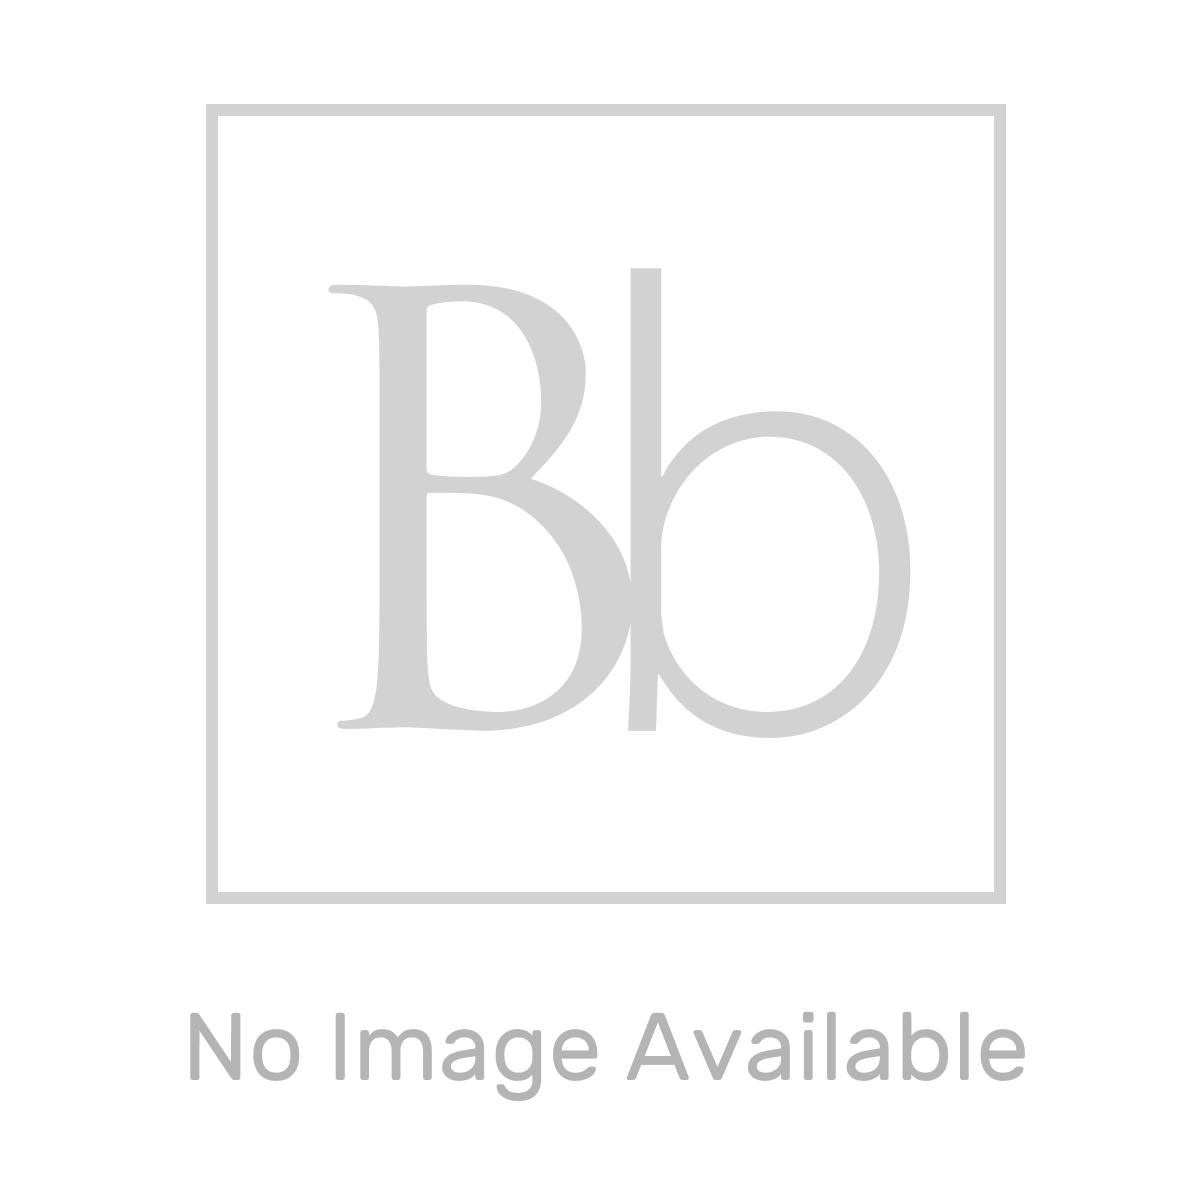 Aquadart Rectangular 1000 x 700 Shower Tray